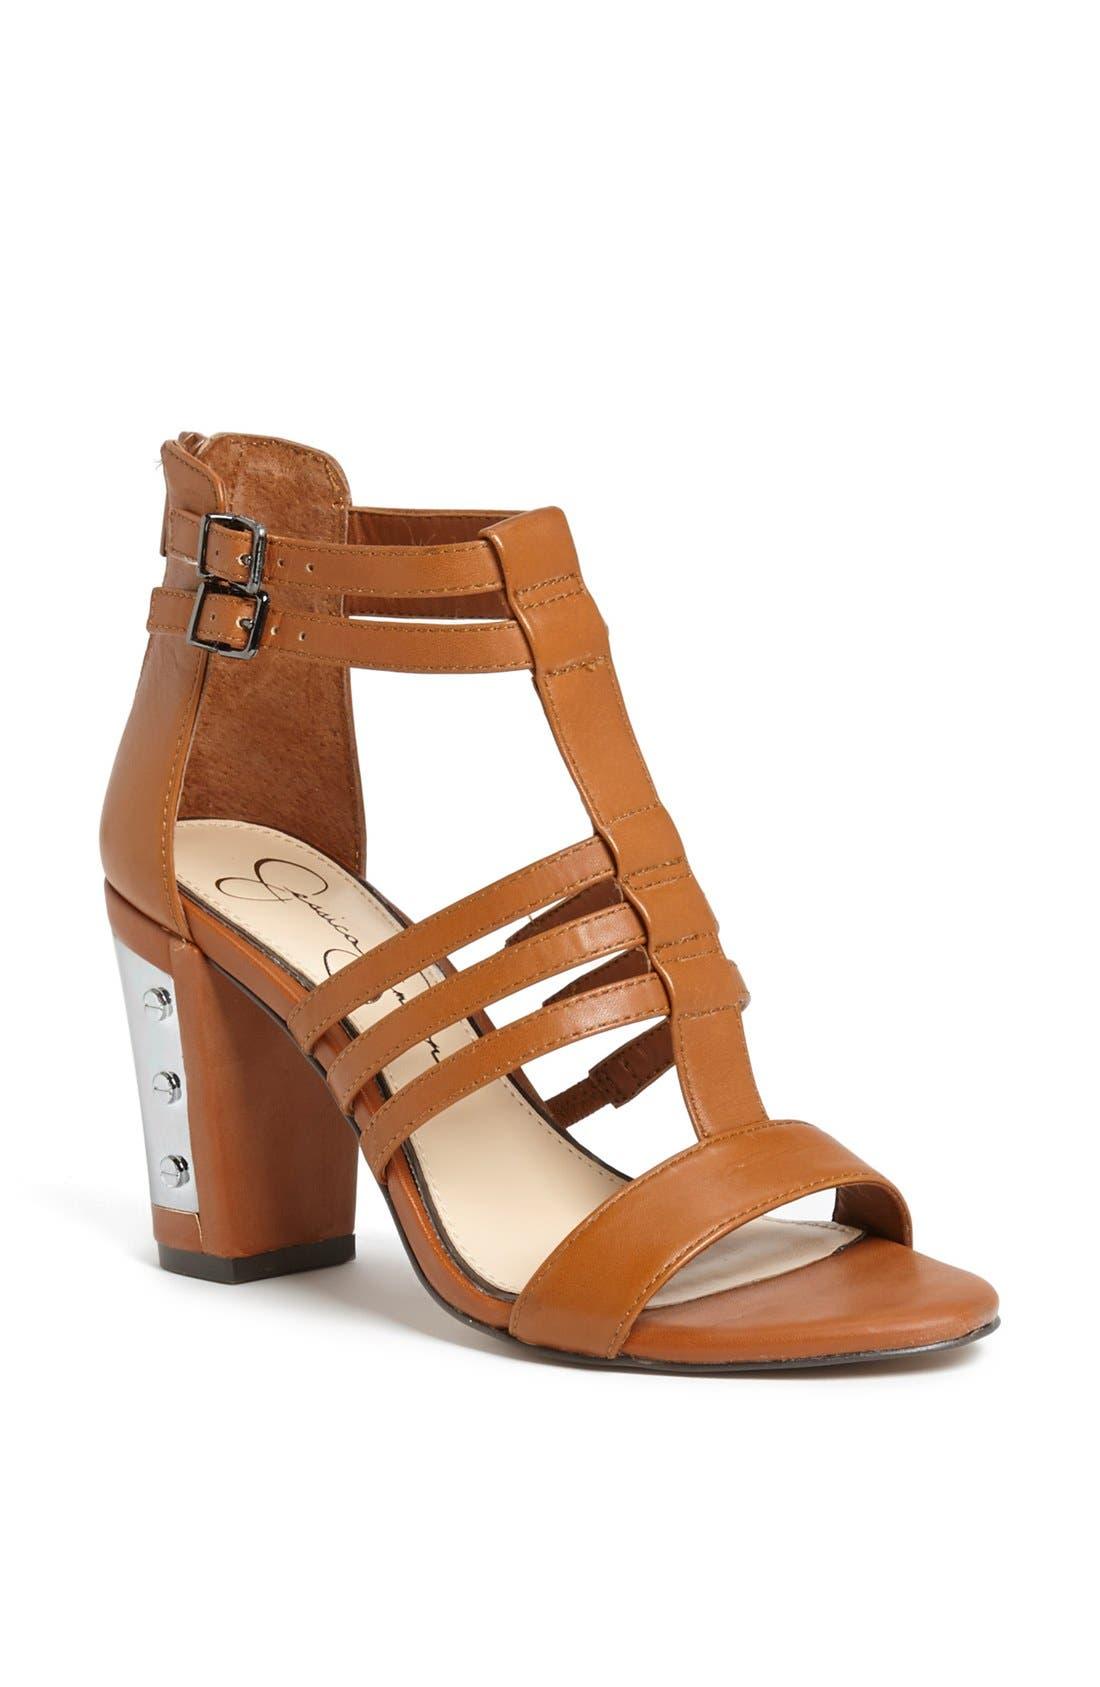 Alternate Image 1 Selected - Jessica Simpson 'Jennisin' Leather Sandal